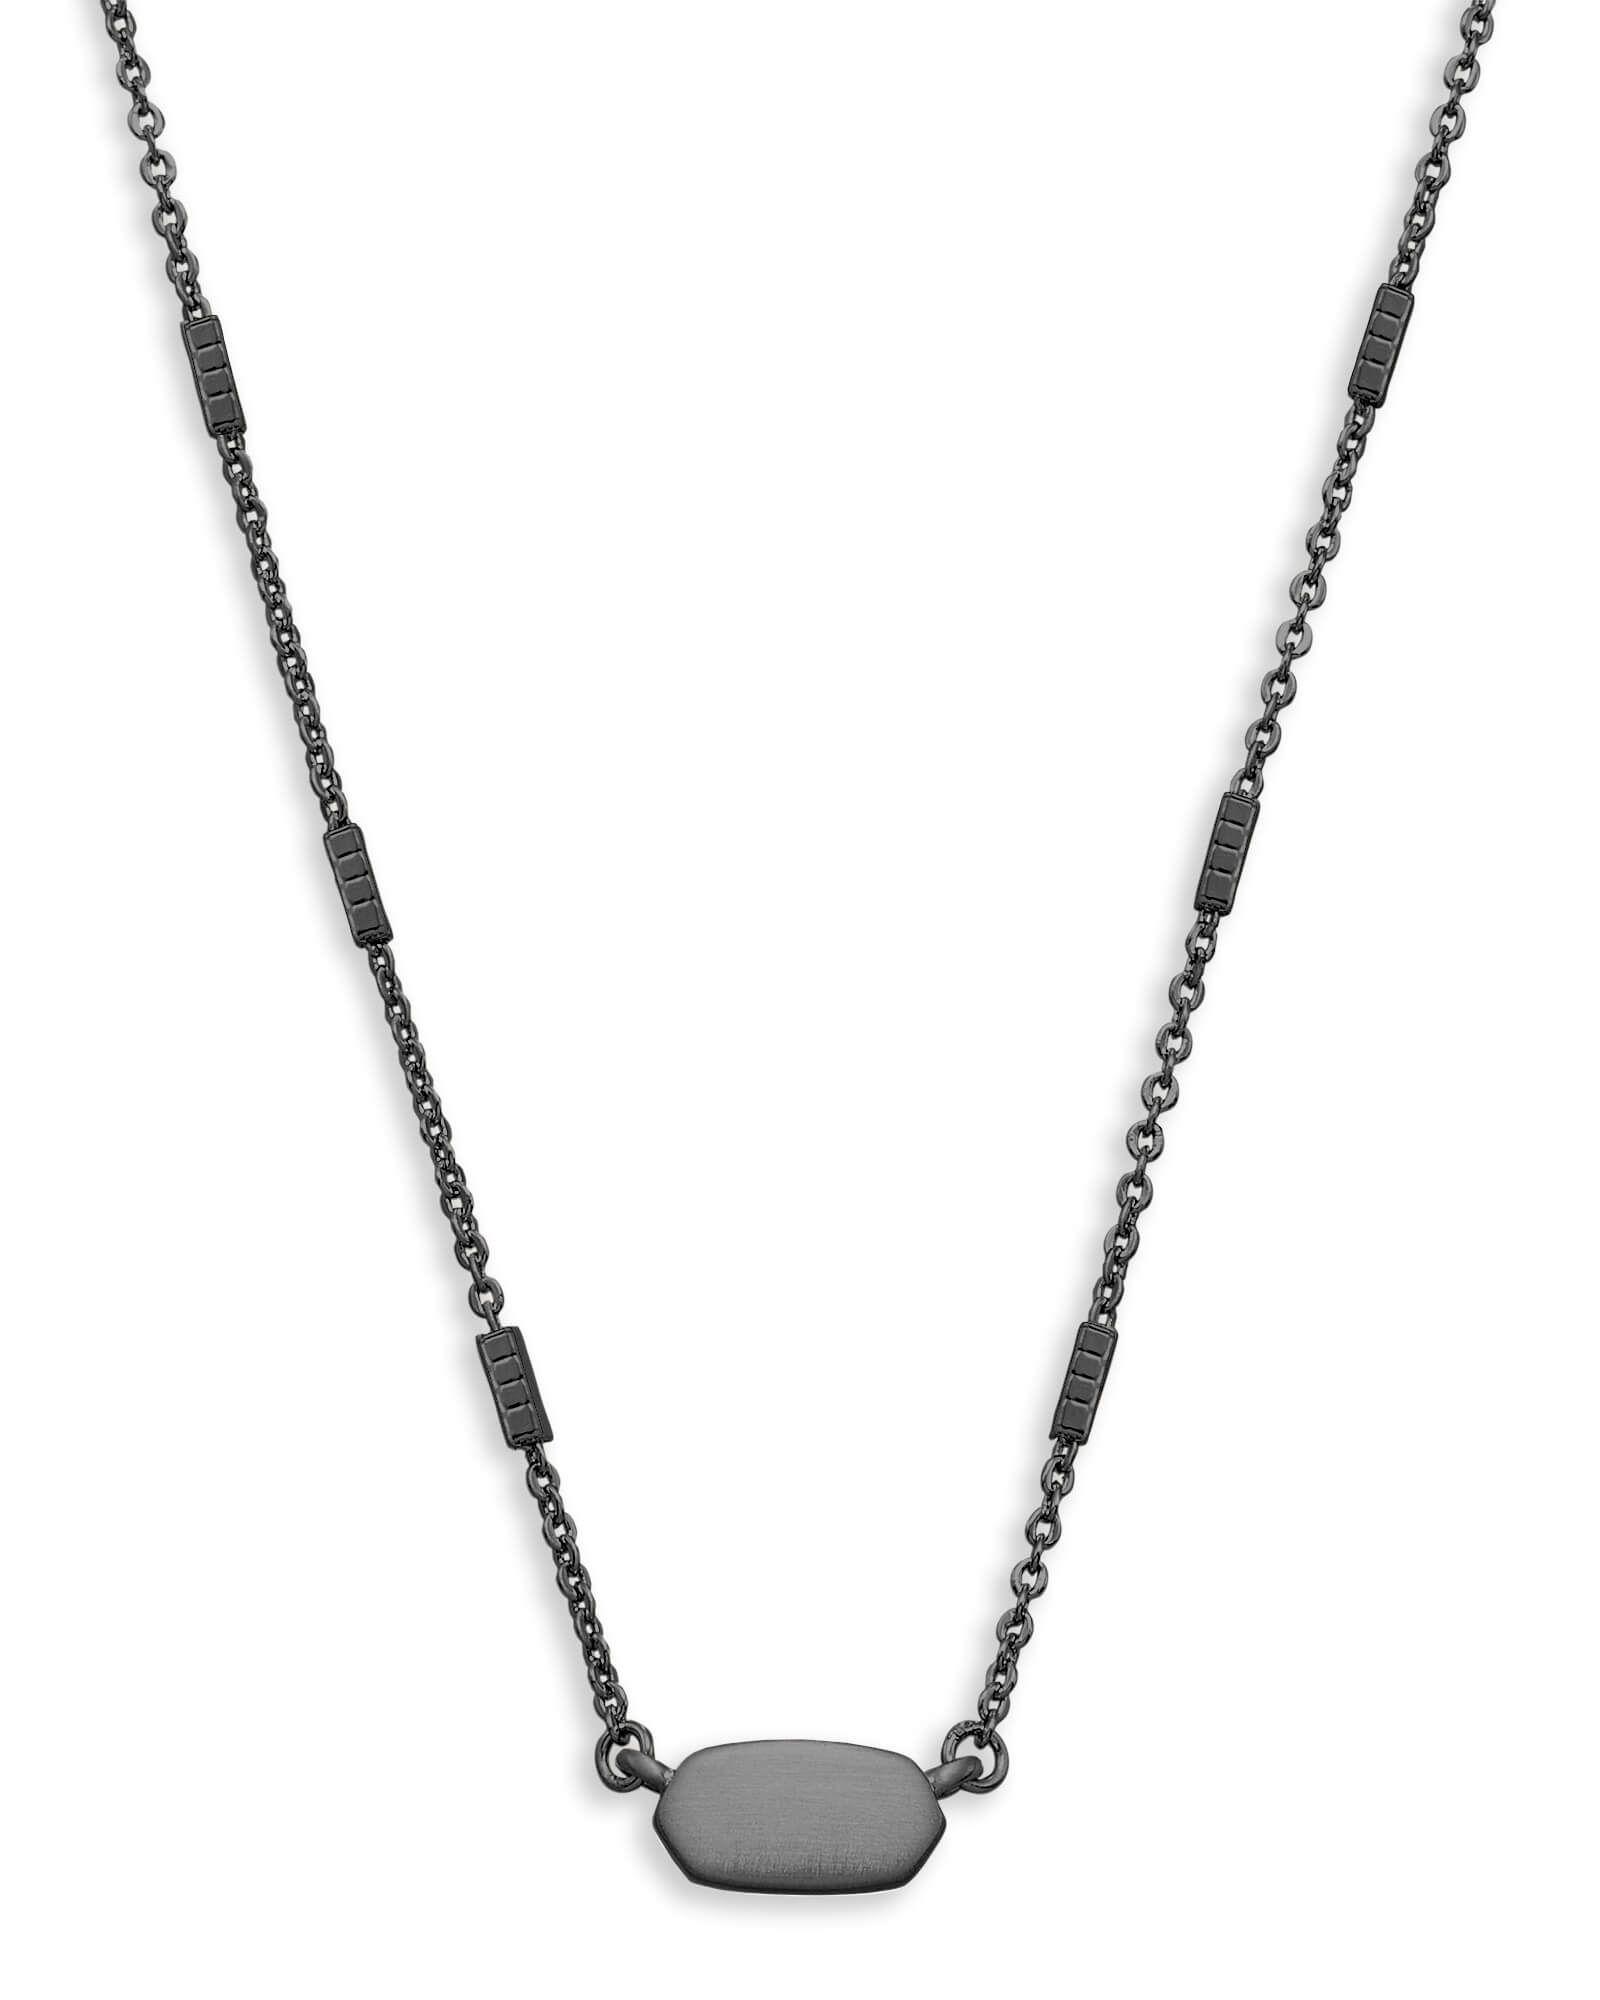 Fern pendant necklace in gunmetal jewelry kendra scott obsession